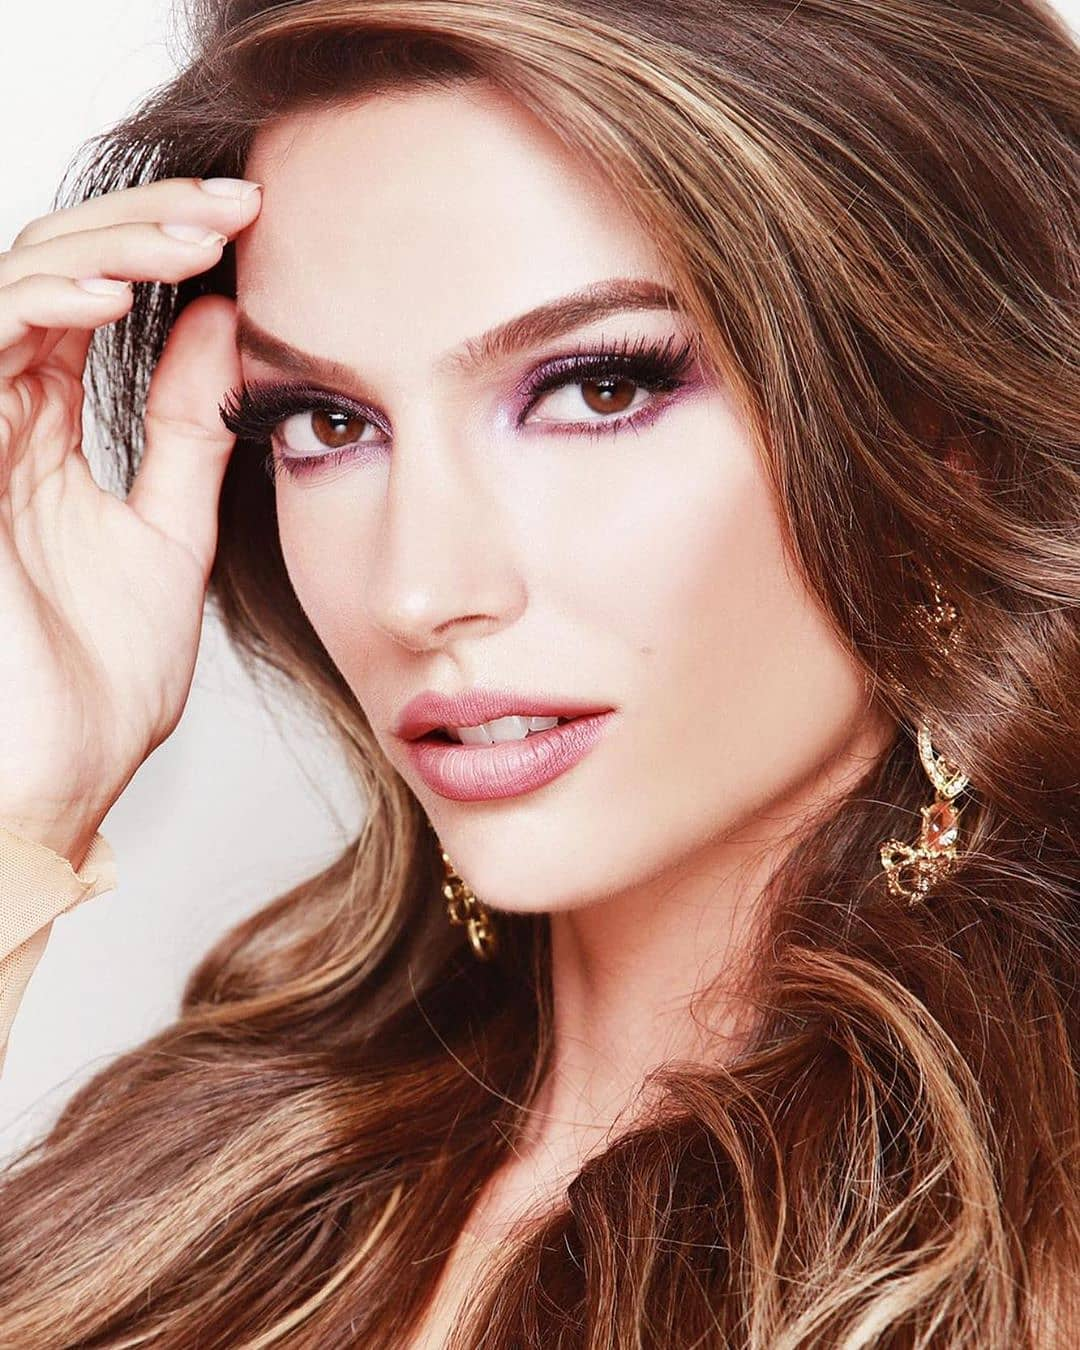 ainara de santamaria villamor, top 21 de miss grand international 2019/miss world cantabria 2018/miss earth spain 2017. - Página 17 73387410